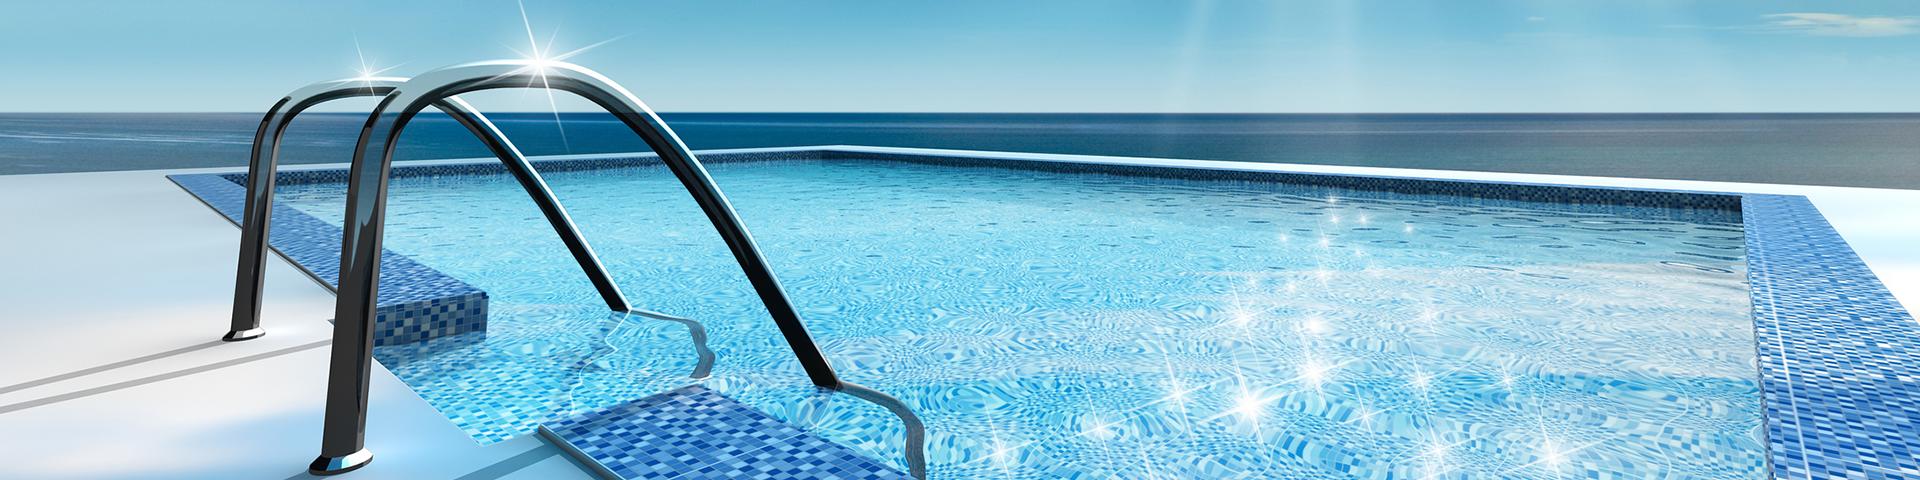 Pro Edge Inground Pools